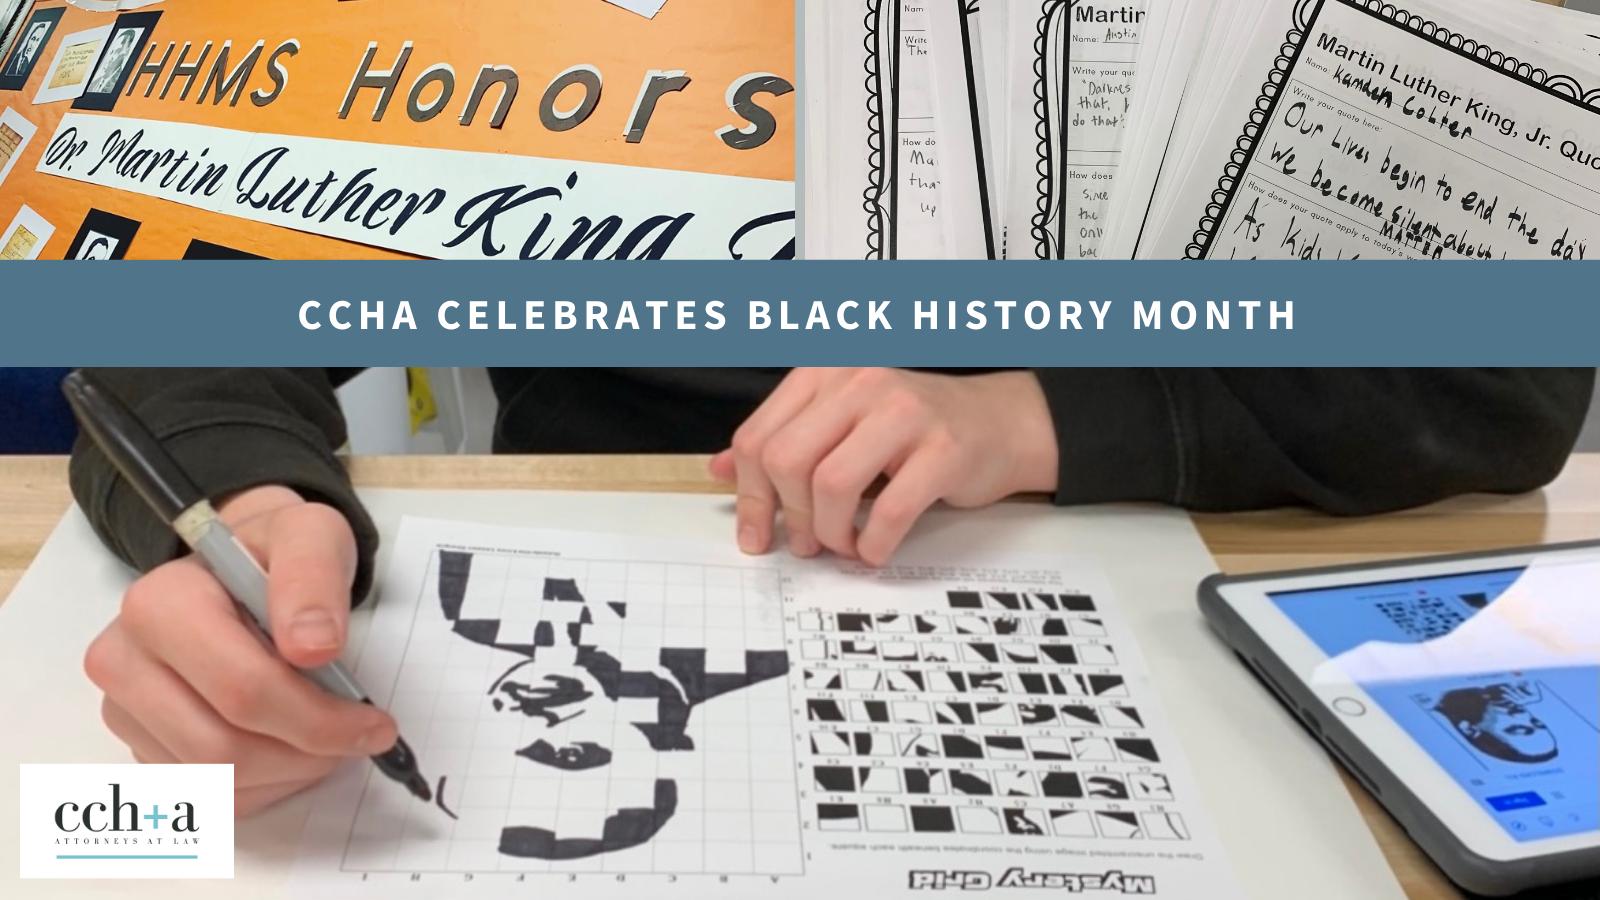 Ccha celebrating black history month 1